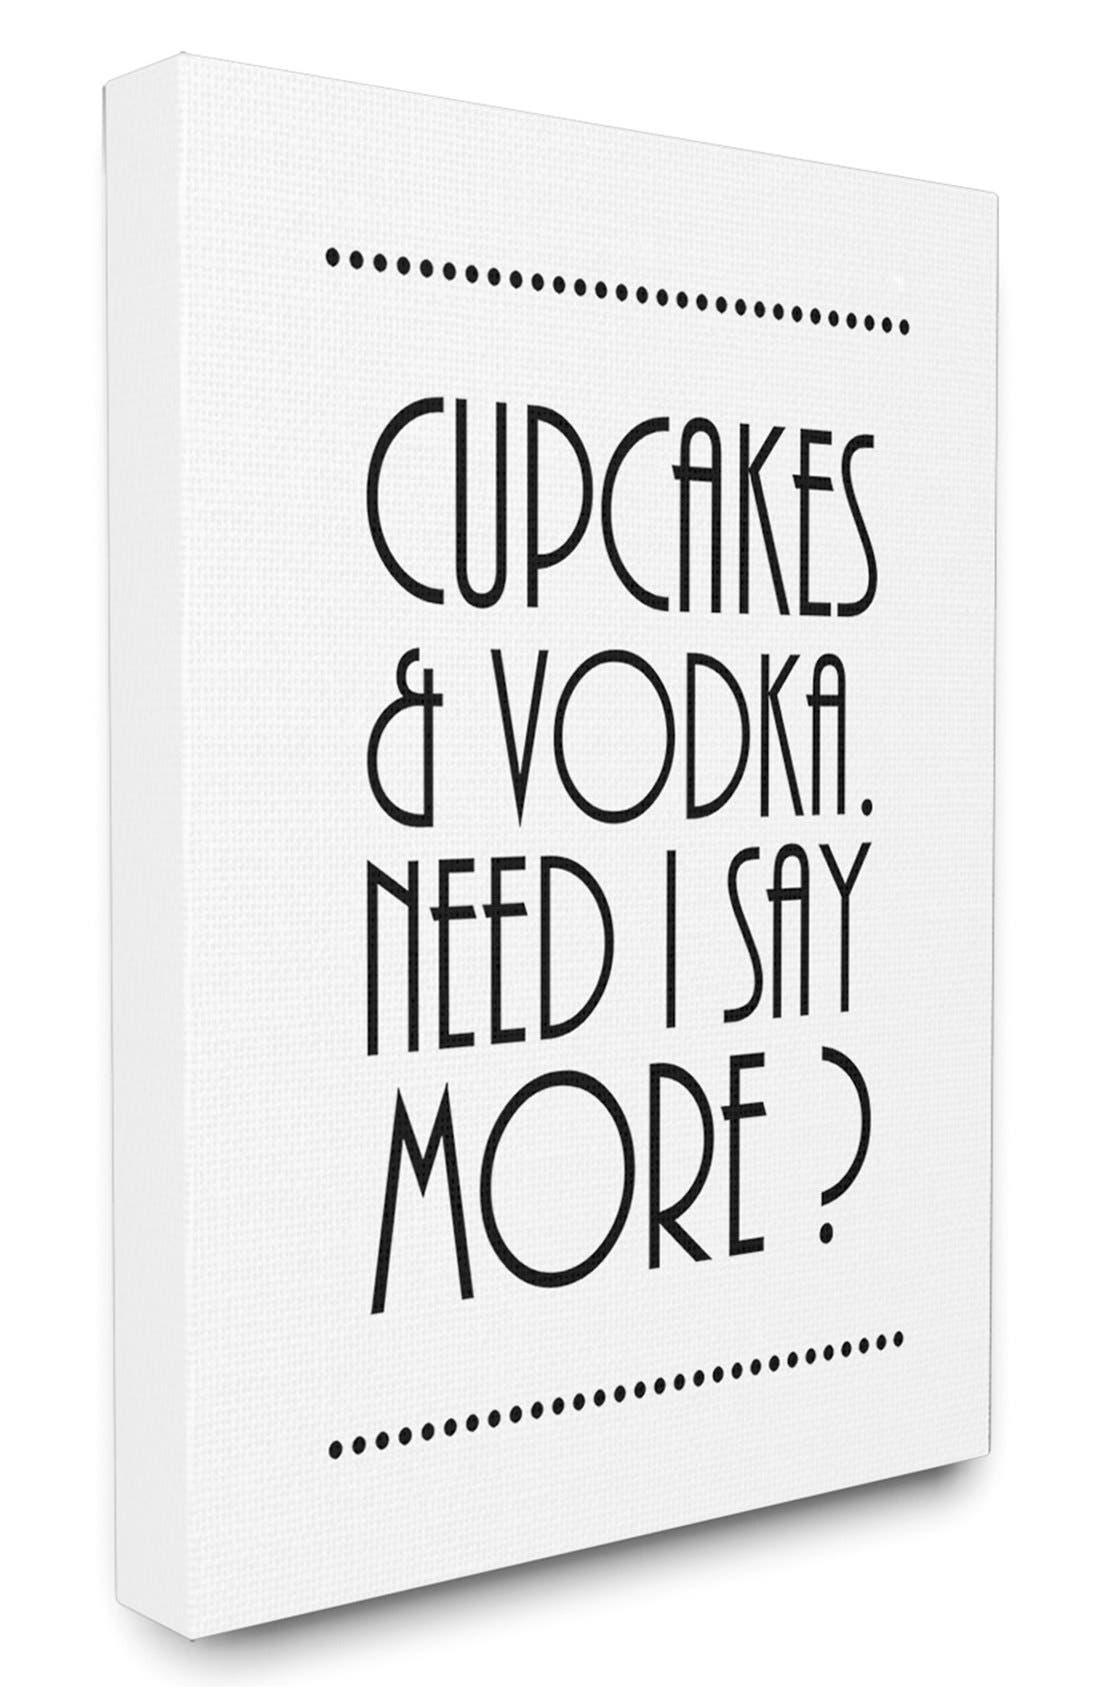 Alternate Image 1 Selected - LulusimonSTUDIO 'Cupcakes & Vodka' Canvas Wall Art